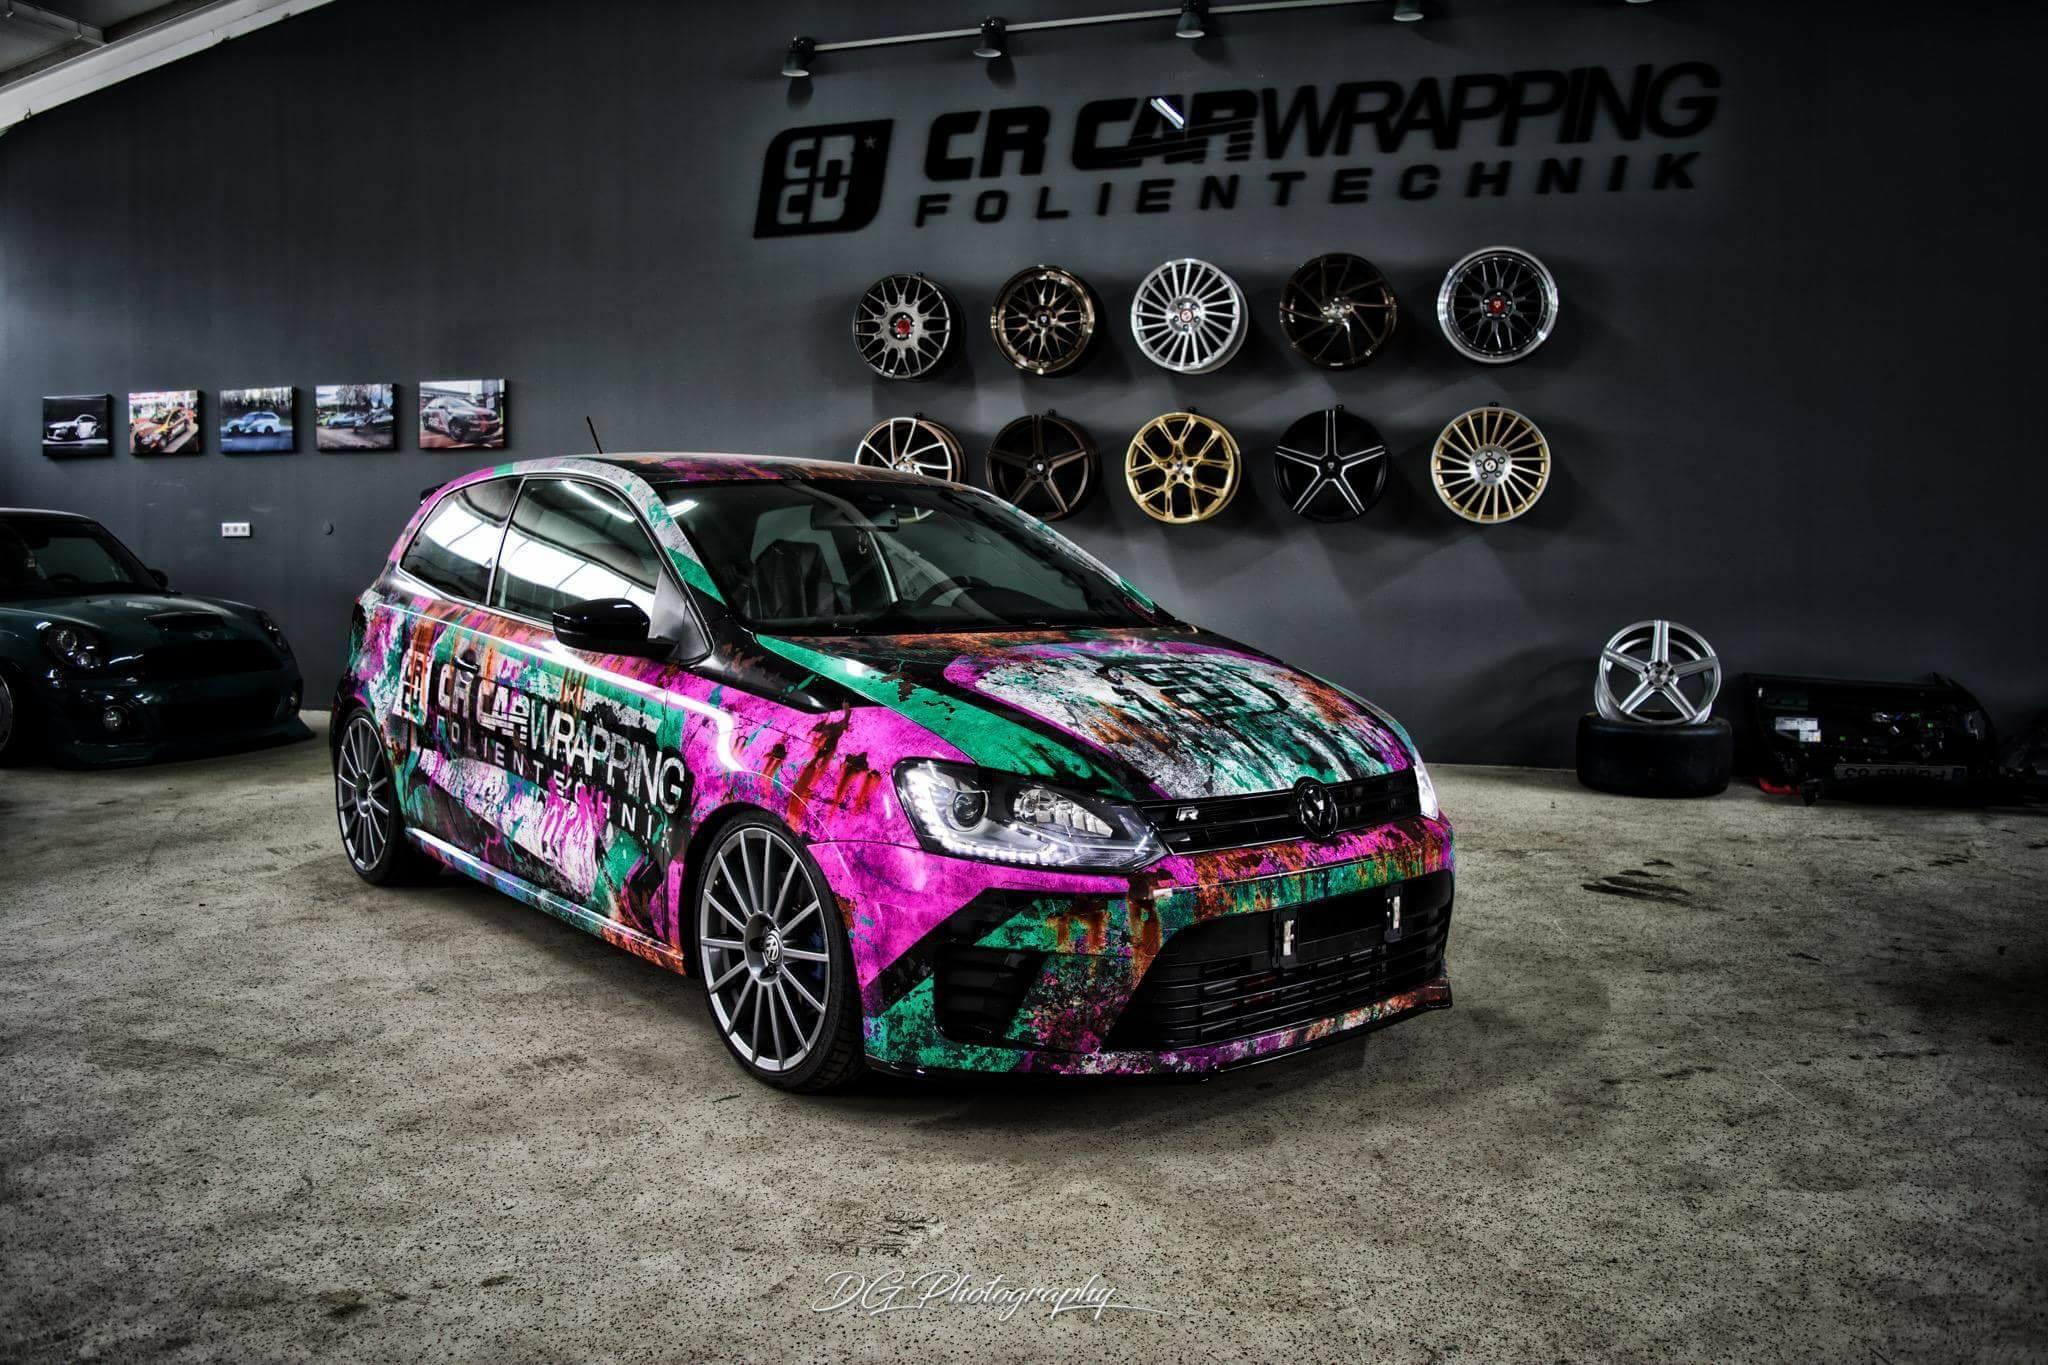 VW Polo Folierung Designfolierung